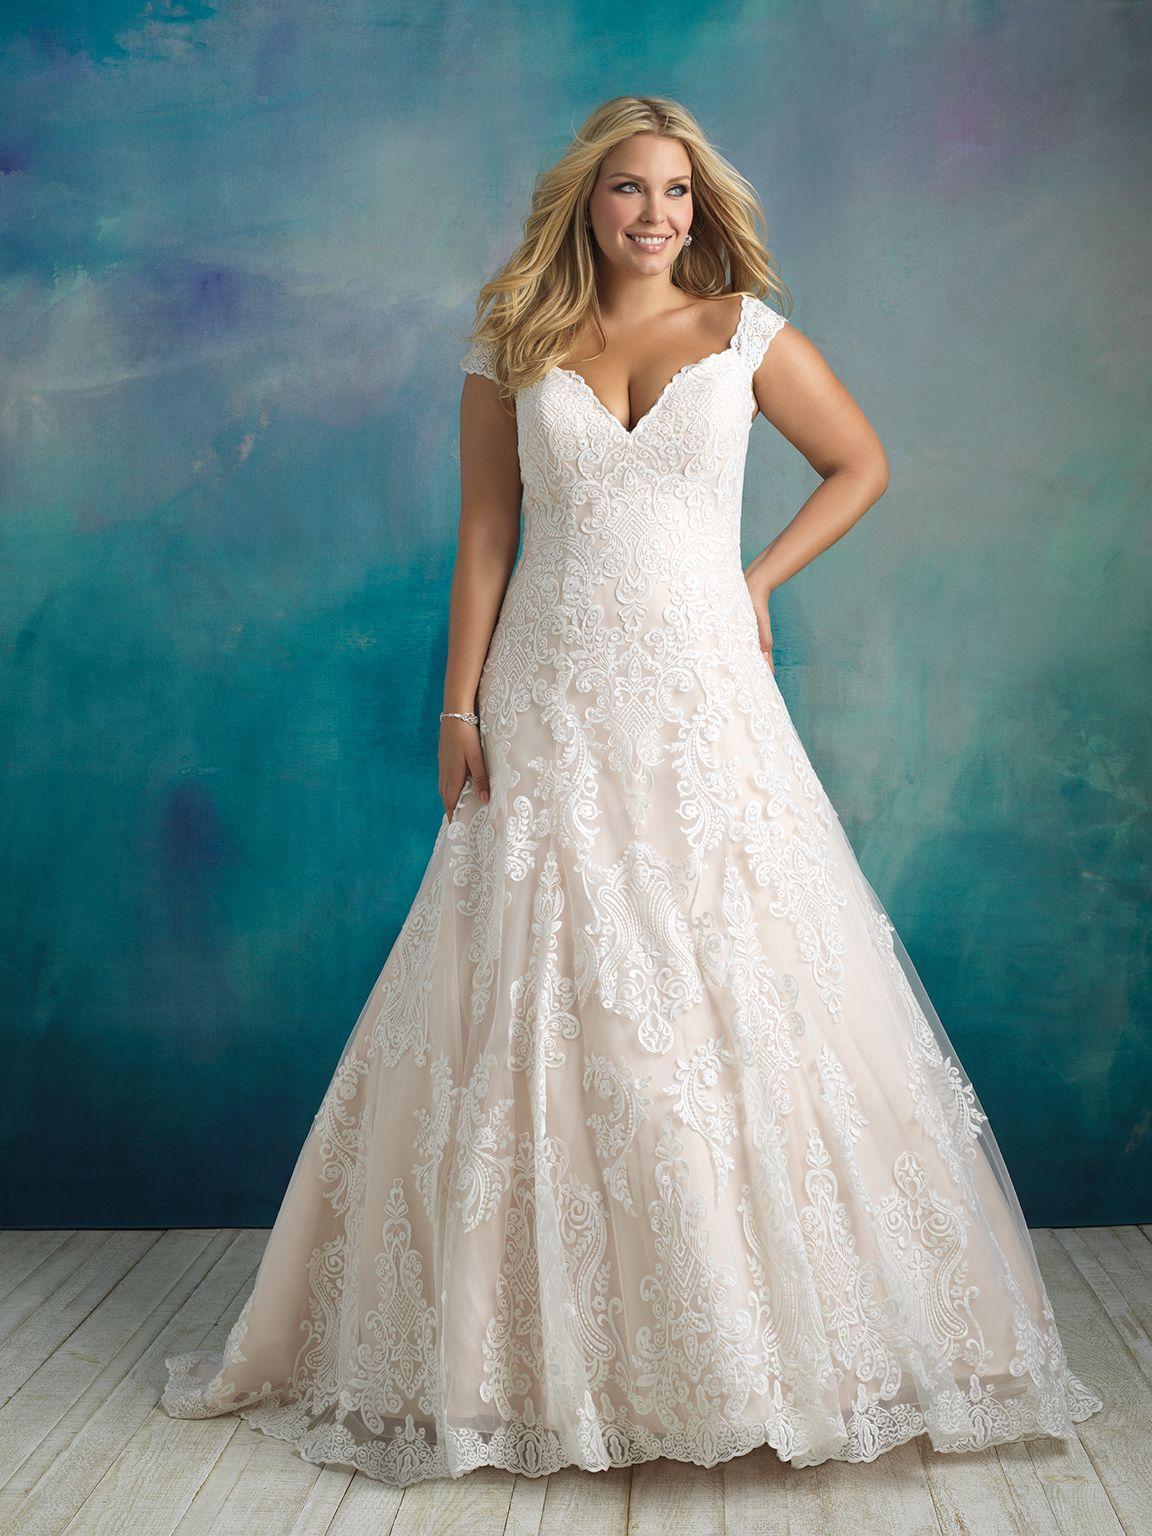 Style W416 Allure Wedding Dresses Allure Bridal Plus Size Bridal Dresses